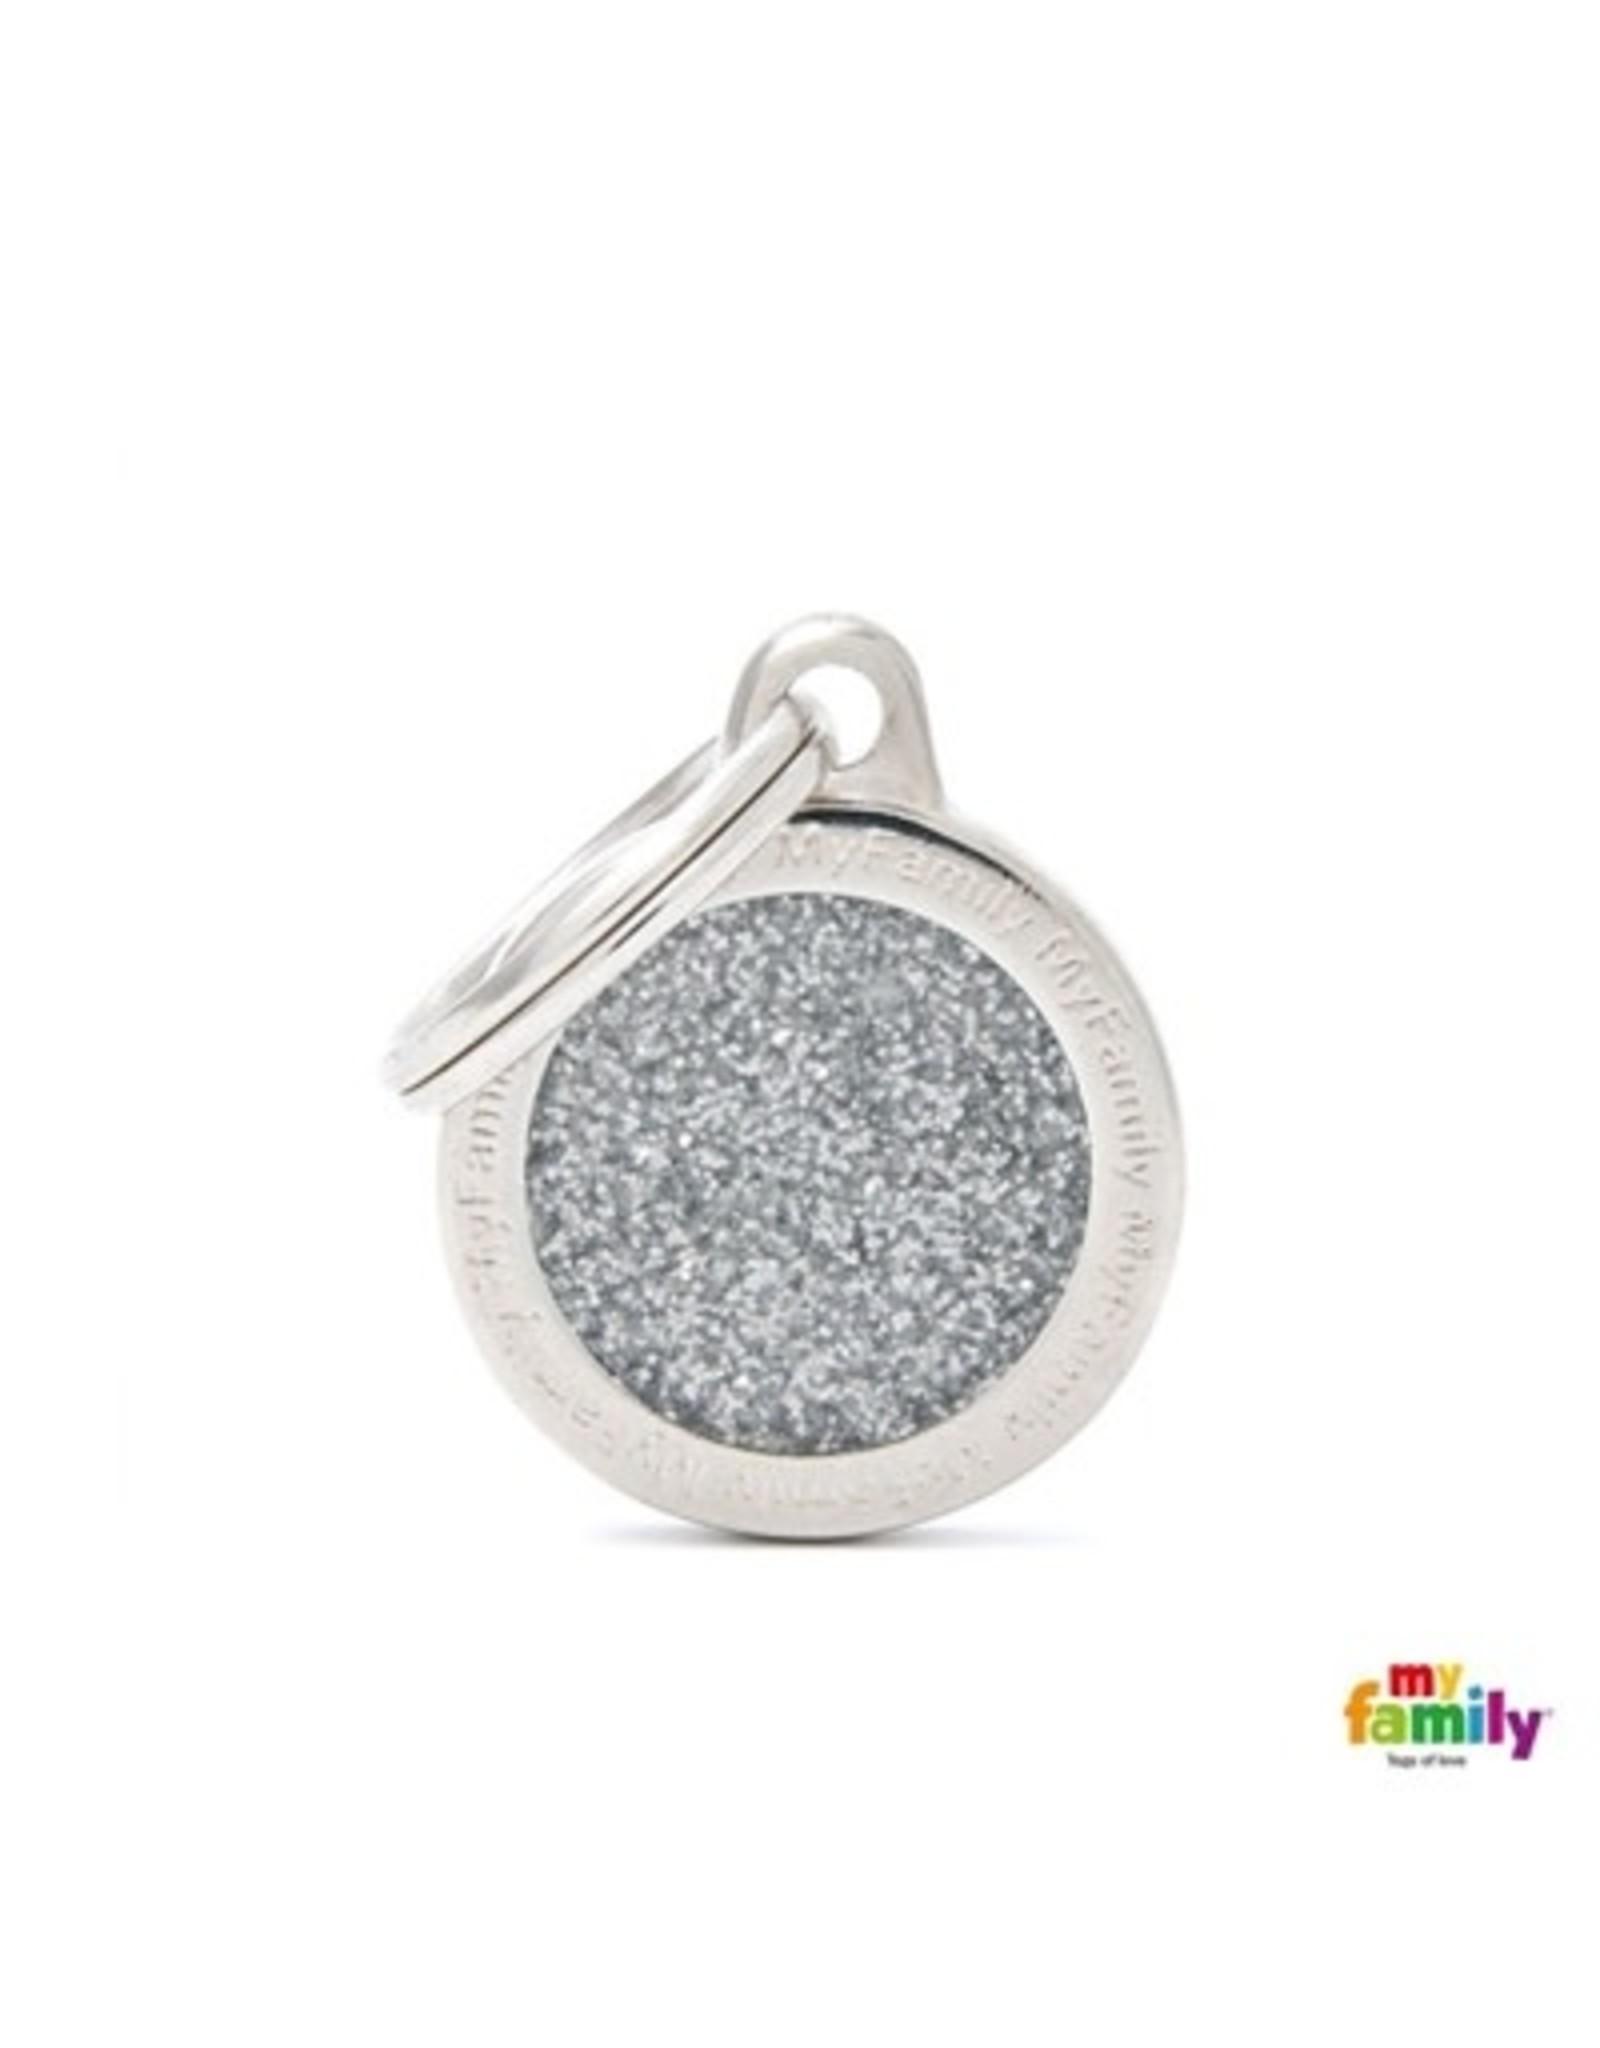 MyFamily Tag - Silver Glitter Circle